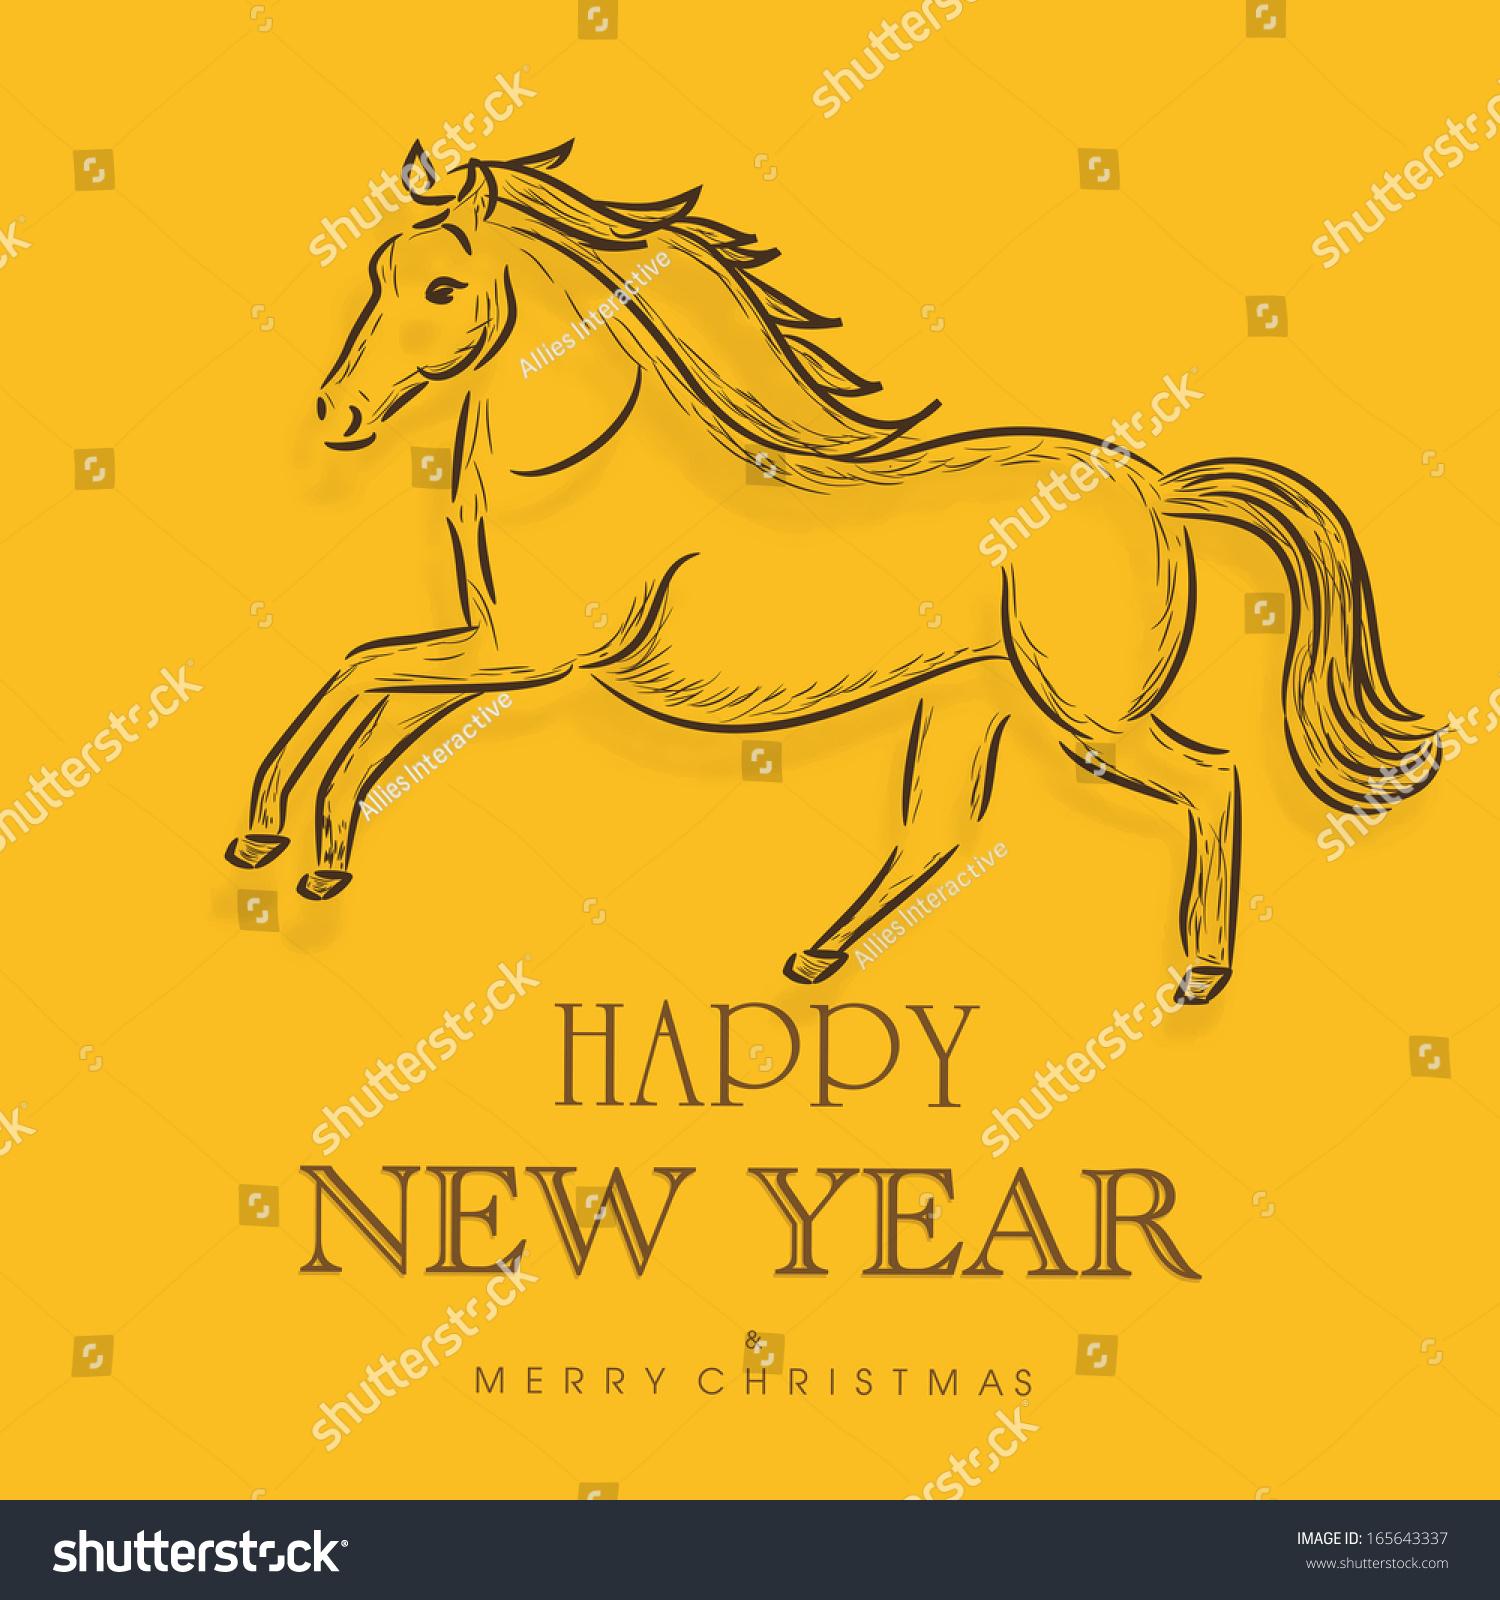 Happy New Year 2014 Celebration Flyer Stock Vector 165643337